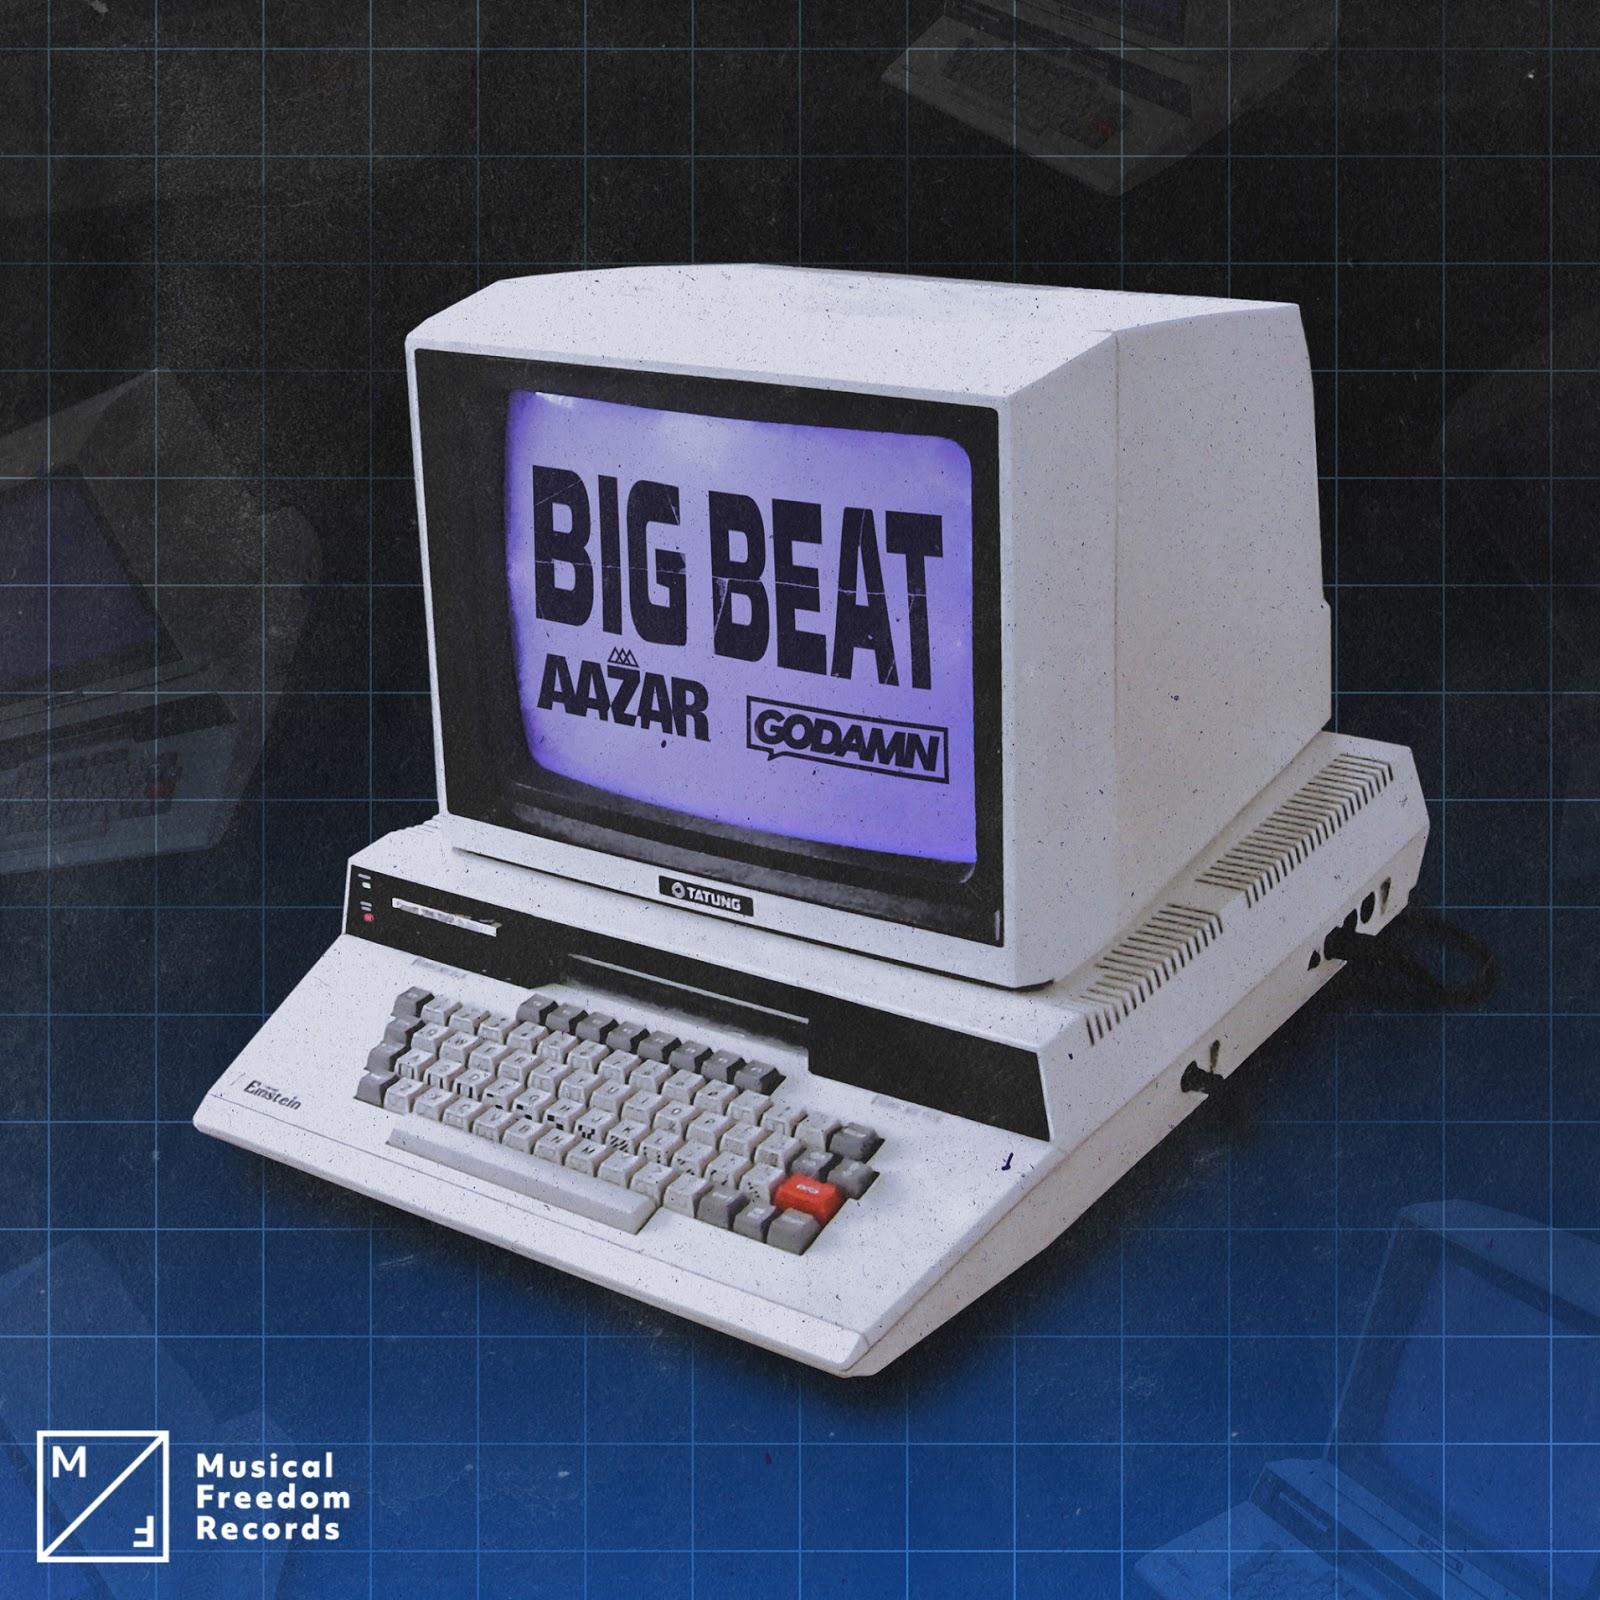 "Résultat de recherche d'images pour ""aazar godamn big beat"""